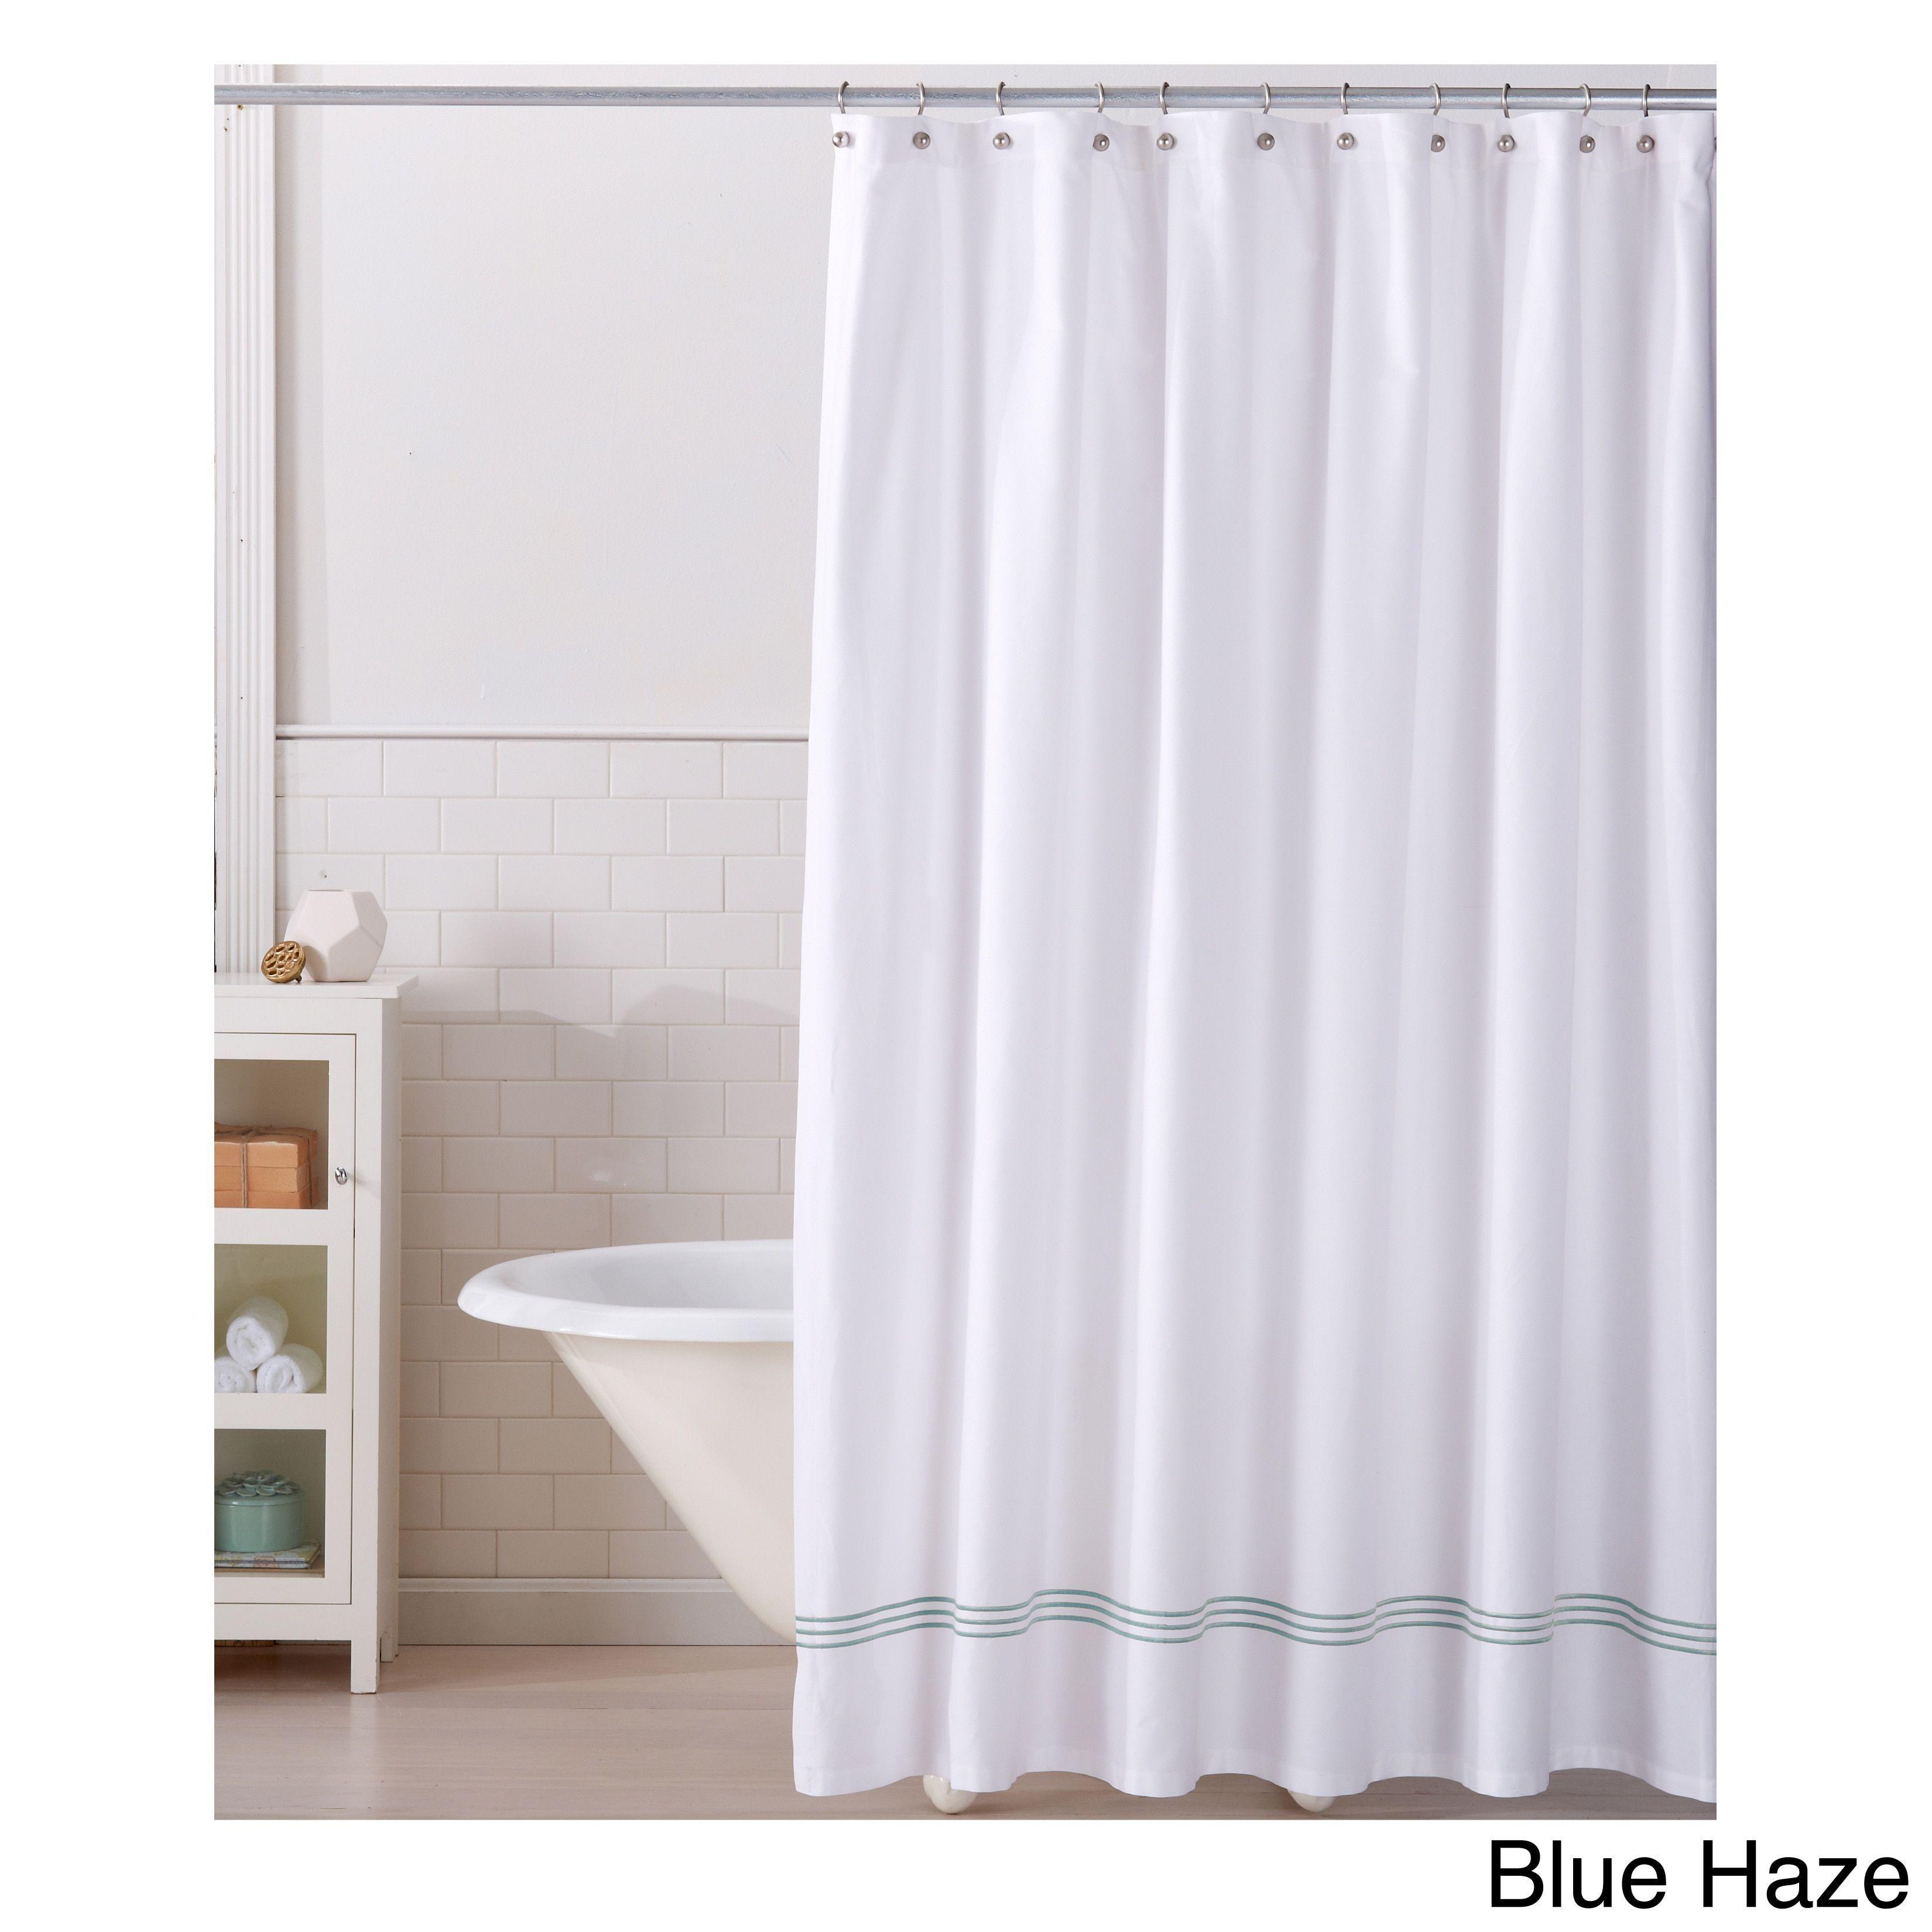 Home fashion designs aurora collection printed heavyweight shower